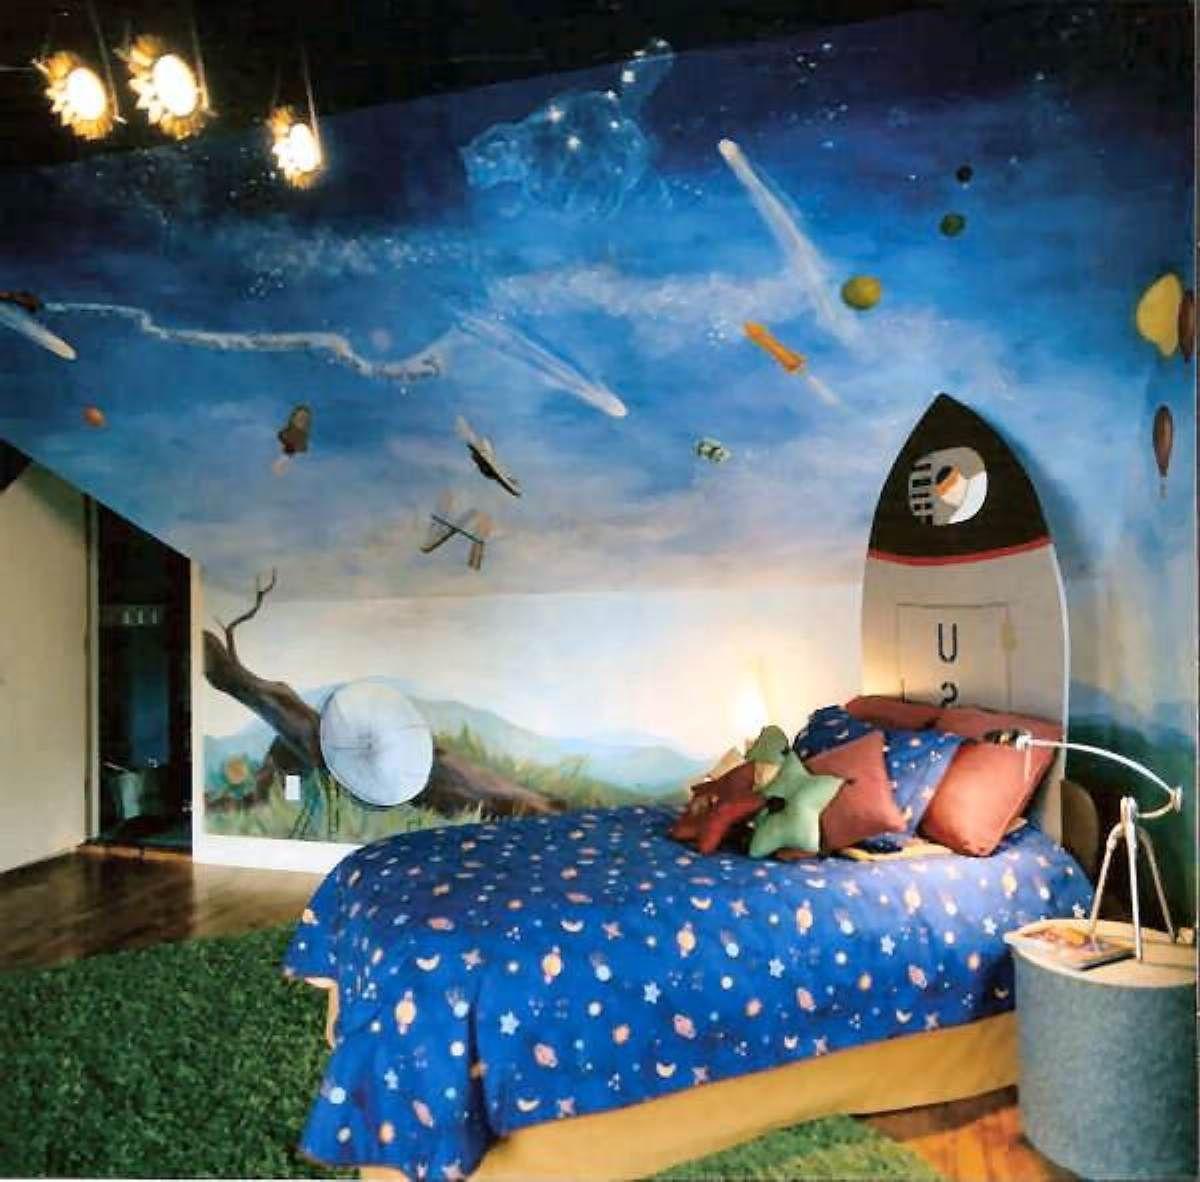 Ordinaire +25 Marvelous Kidsu0027 Rooms Ceiling Designs Ideas